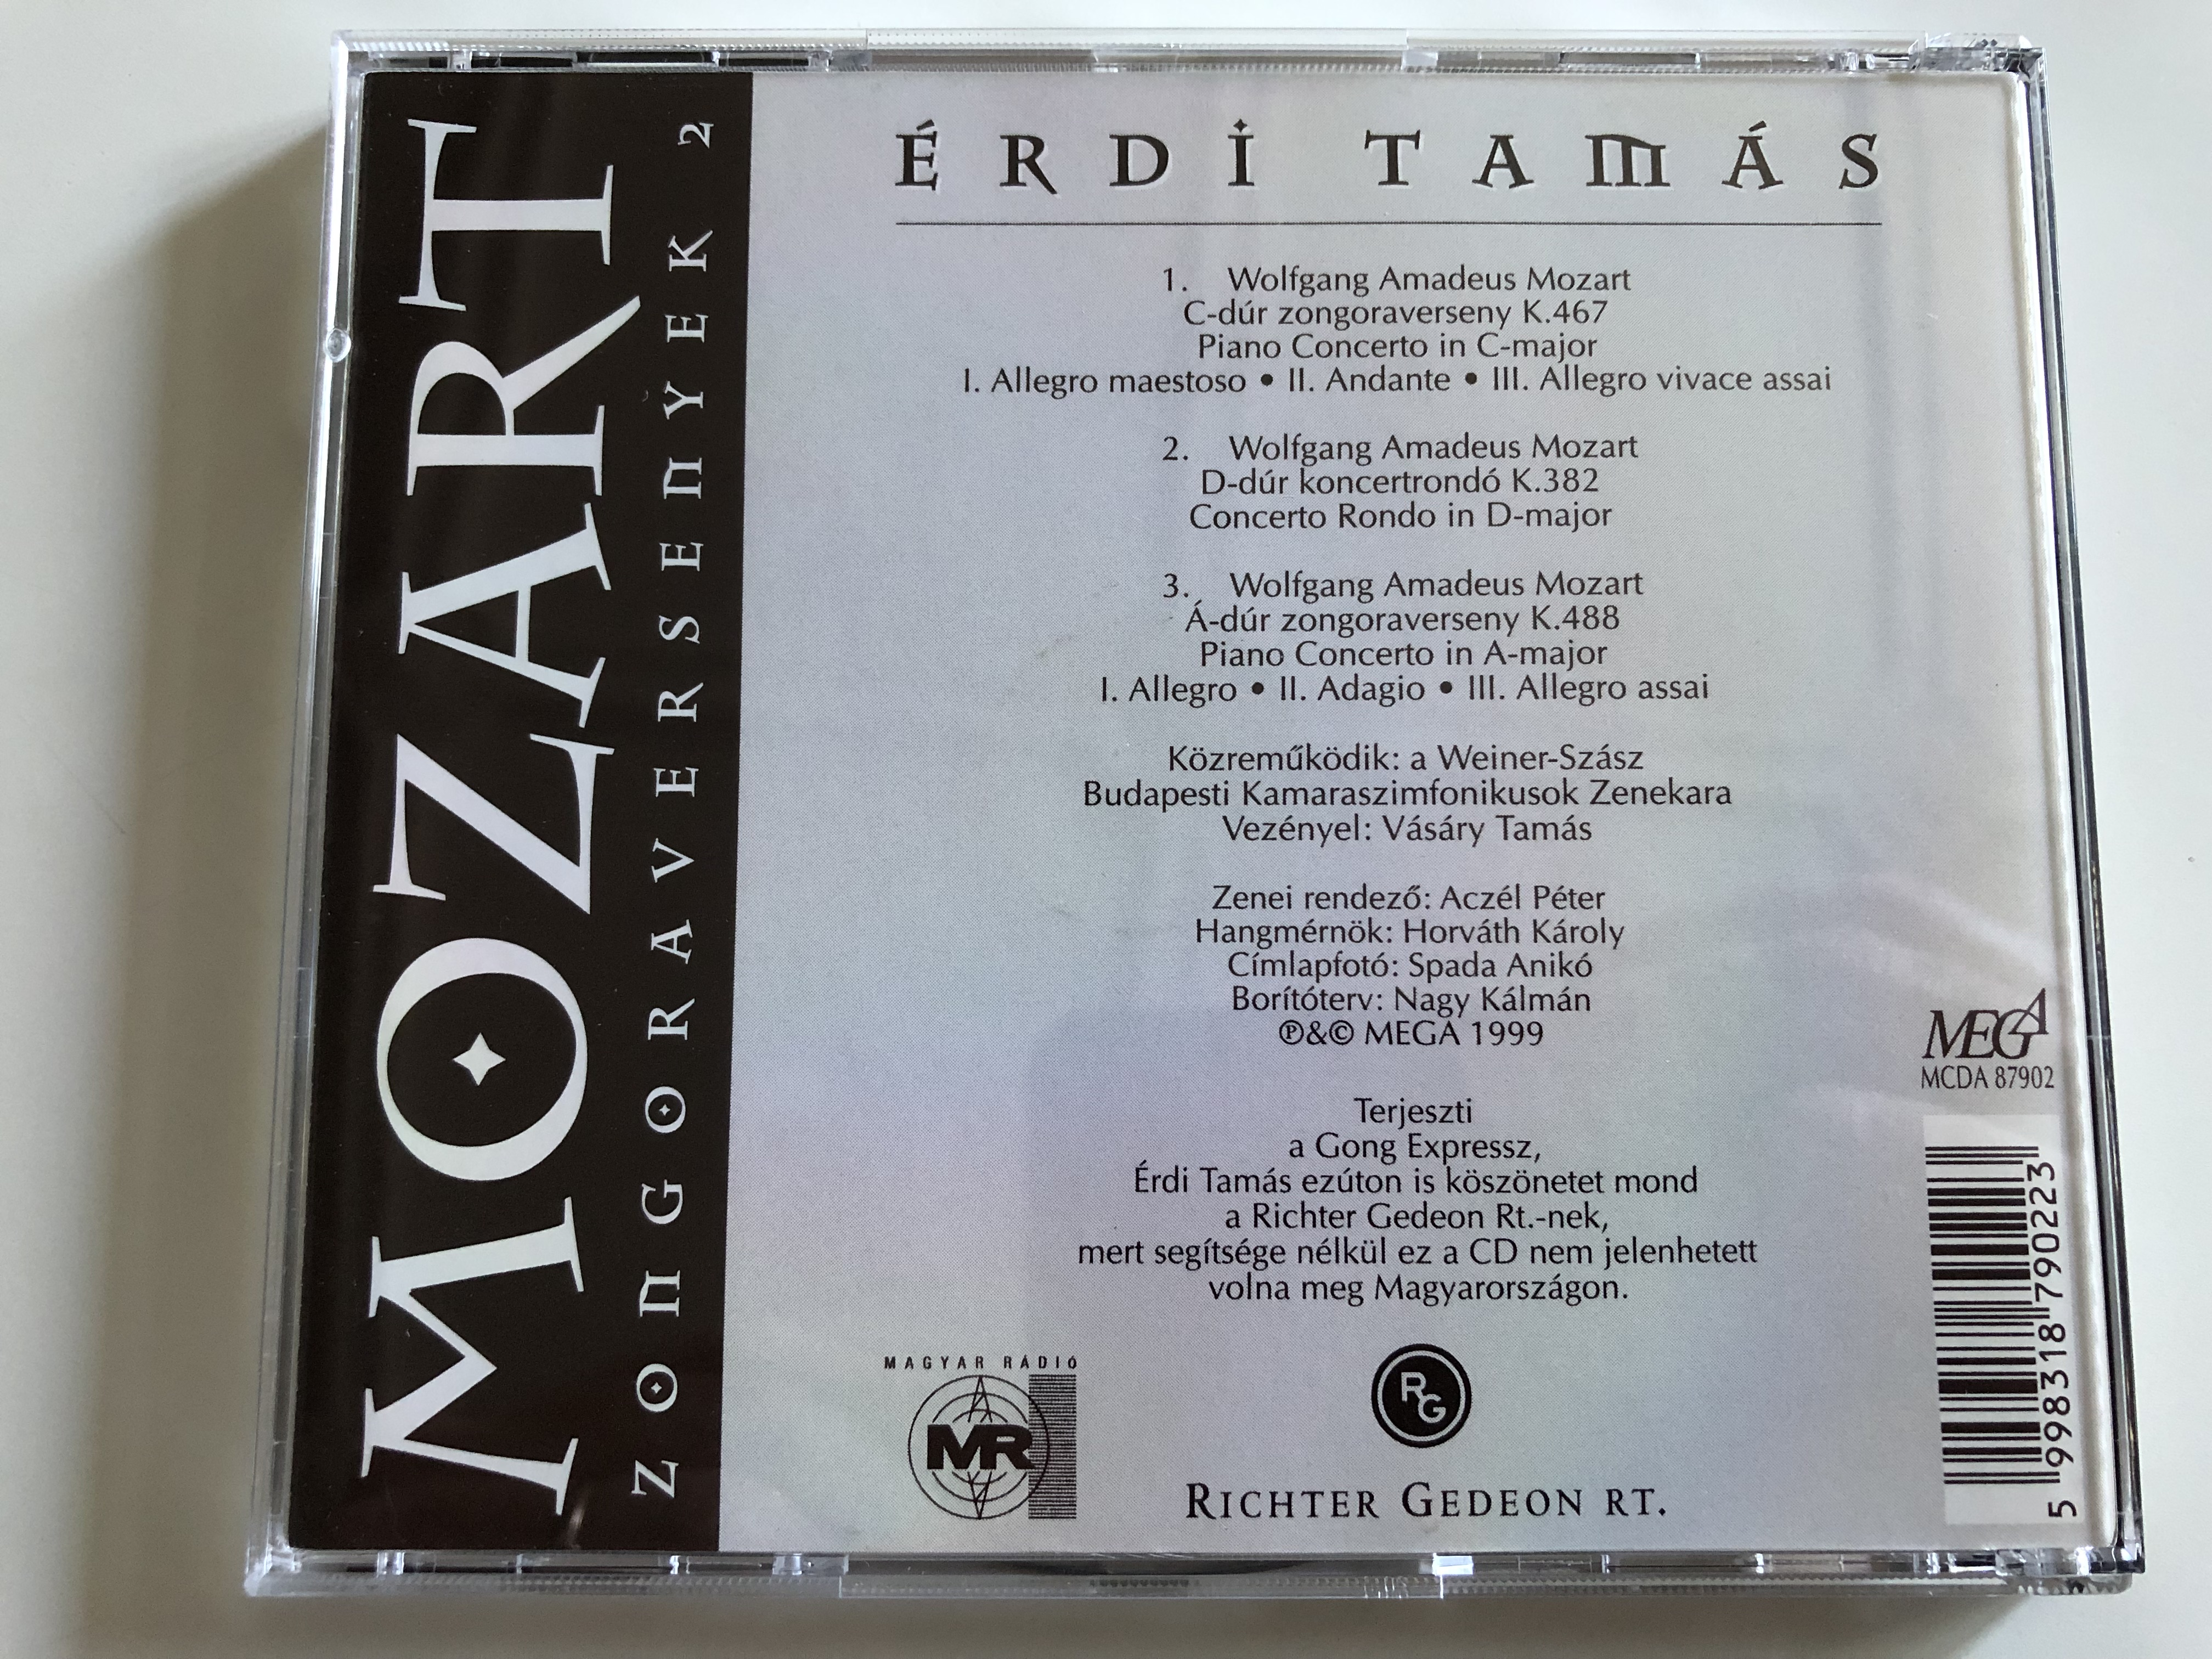 mozart-zongoraversenyek-2-erdi-tamas-mega-audio-cd-mcda-87902-10-.jpg